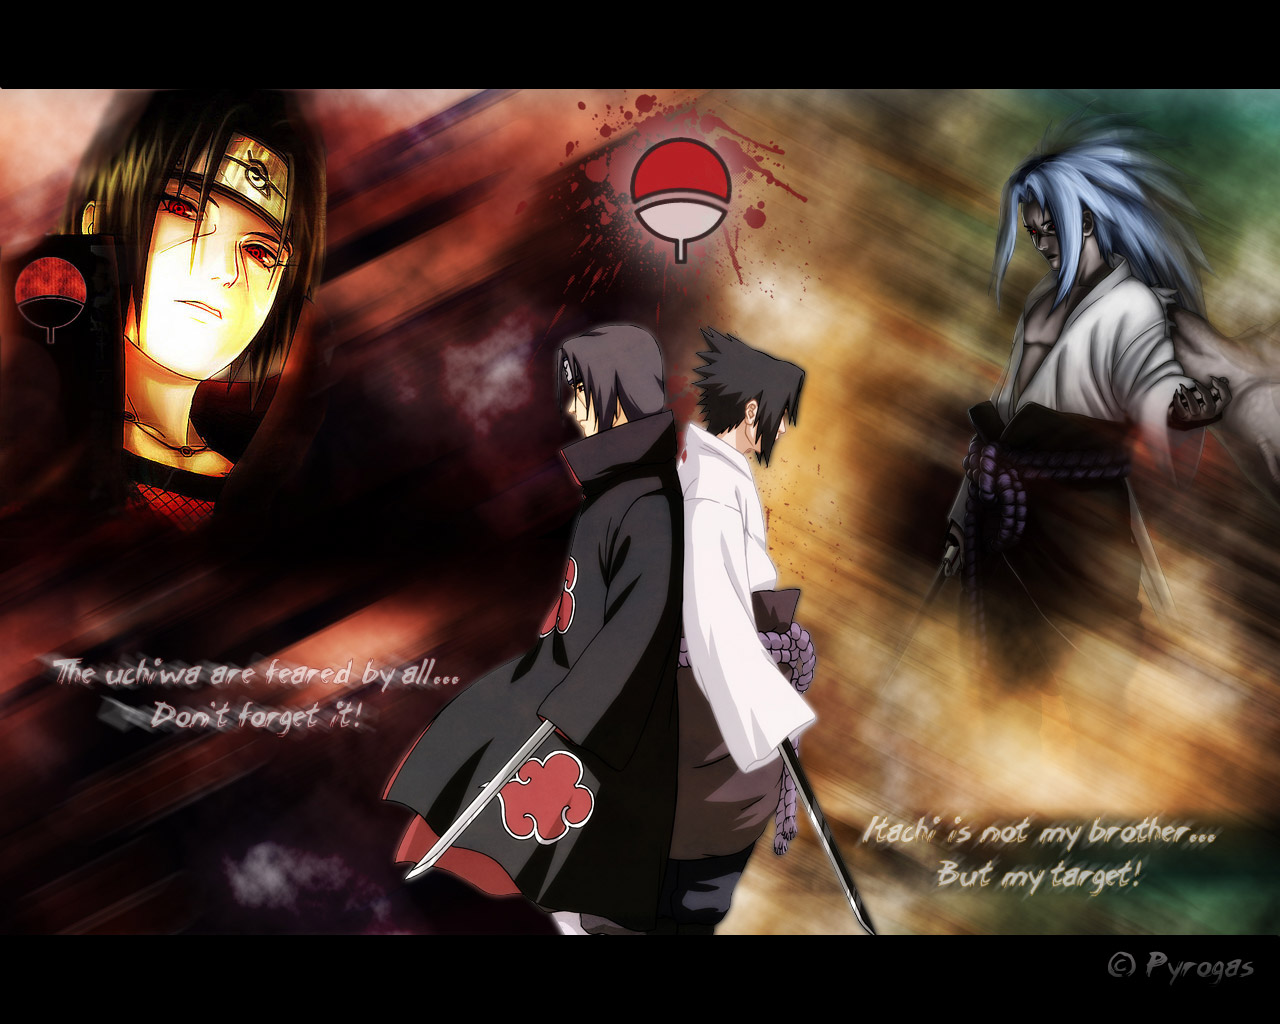 Naruto Shippuden Wallpaper Itachi 10556 Hd Wallpapers in Anime 1280x1024